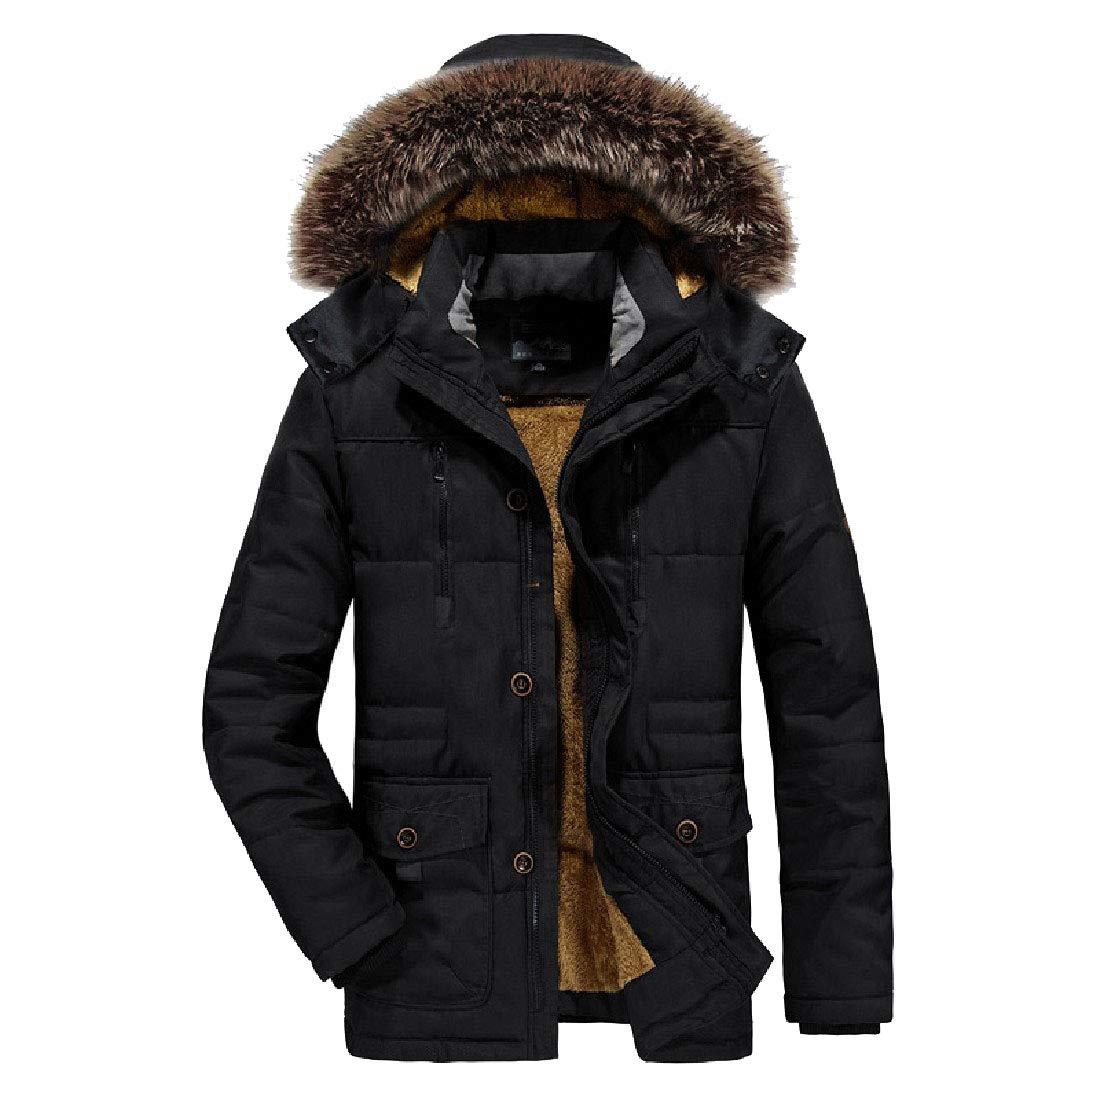 RSunshine Mens Mid Long Faux Fur Hooded Plus-Size Winter Parka Anorak